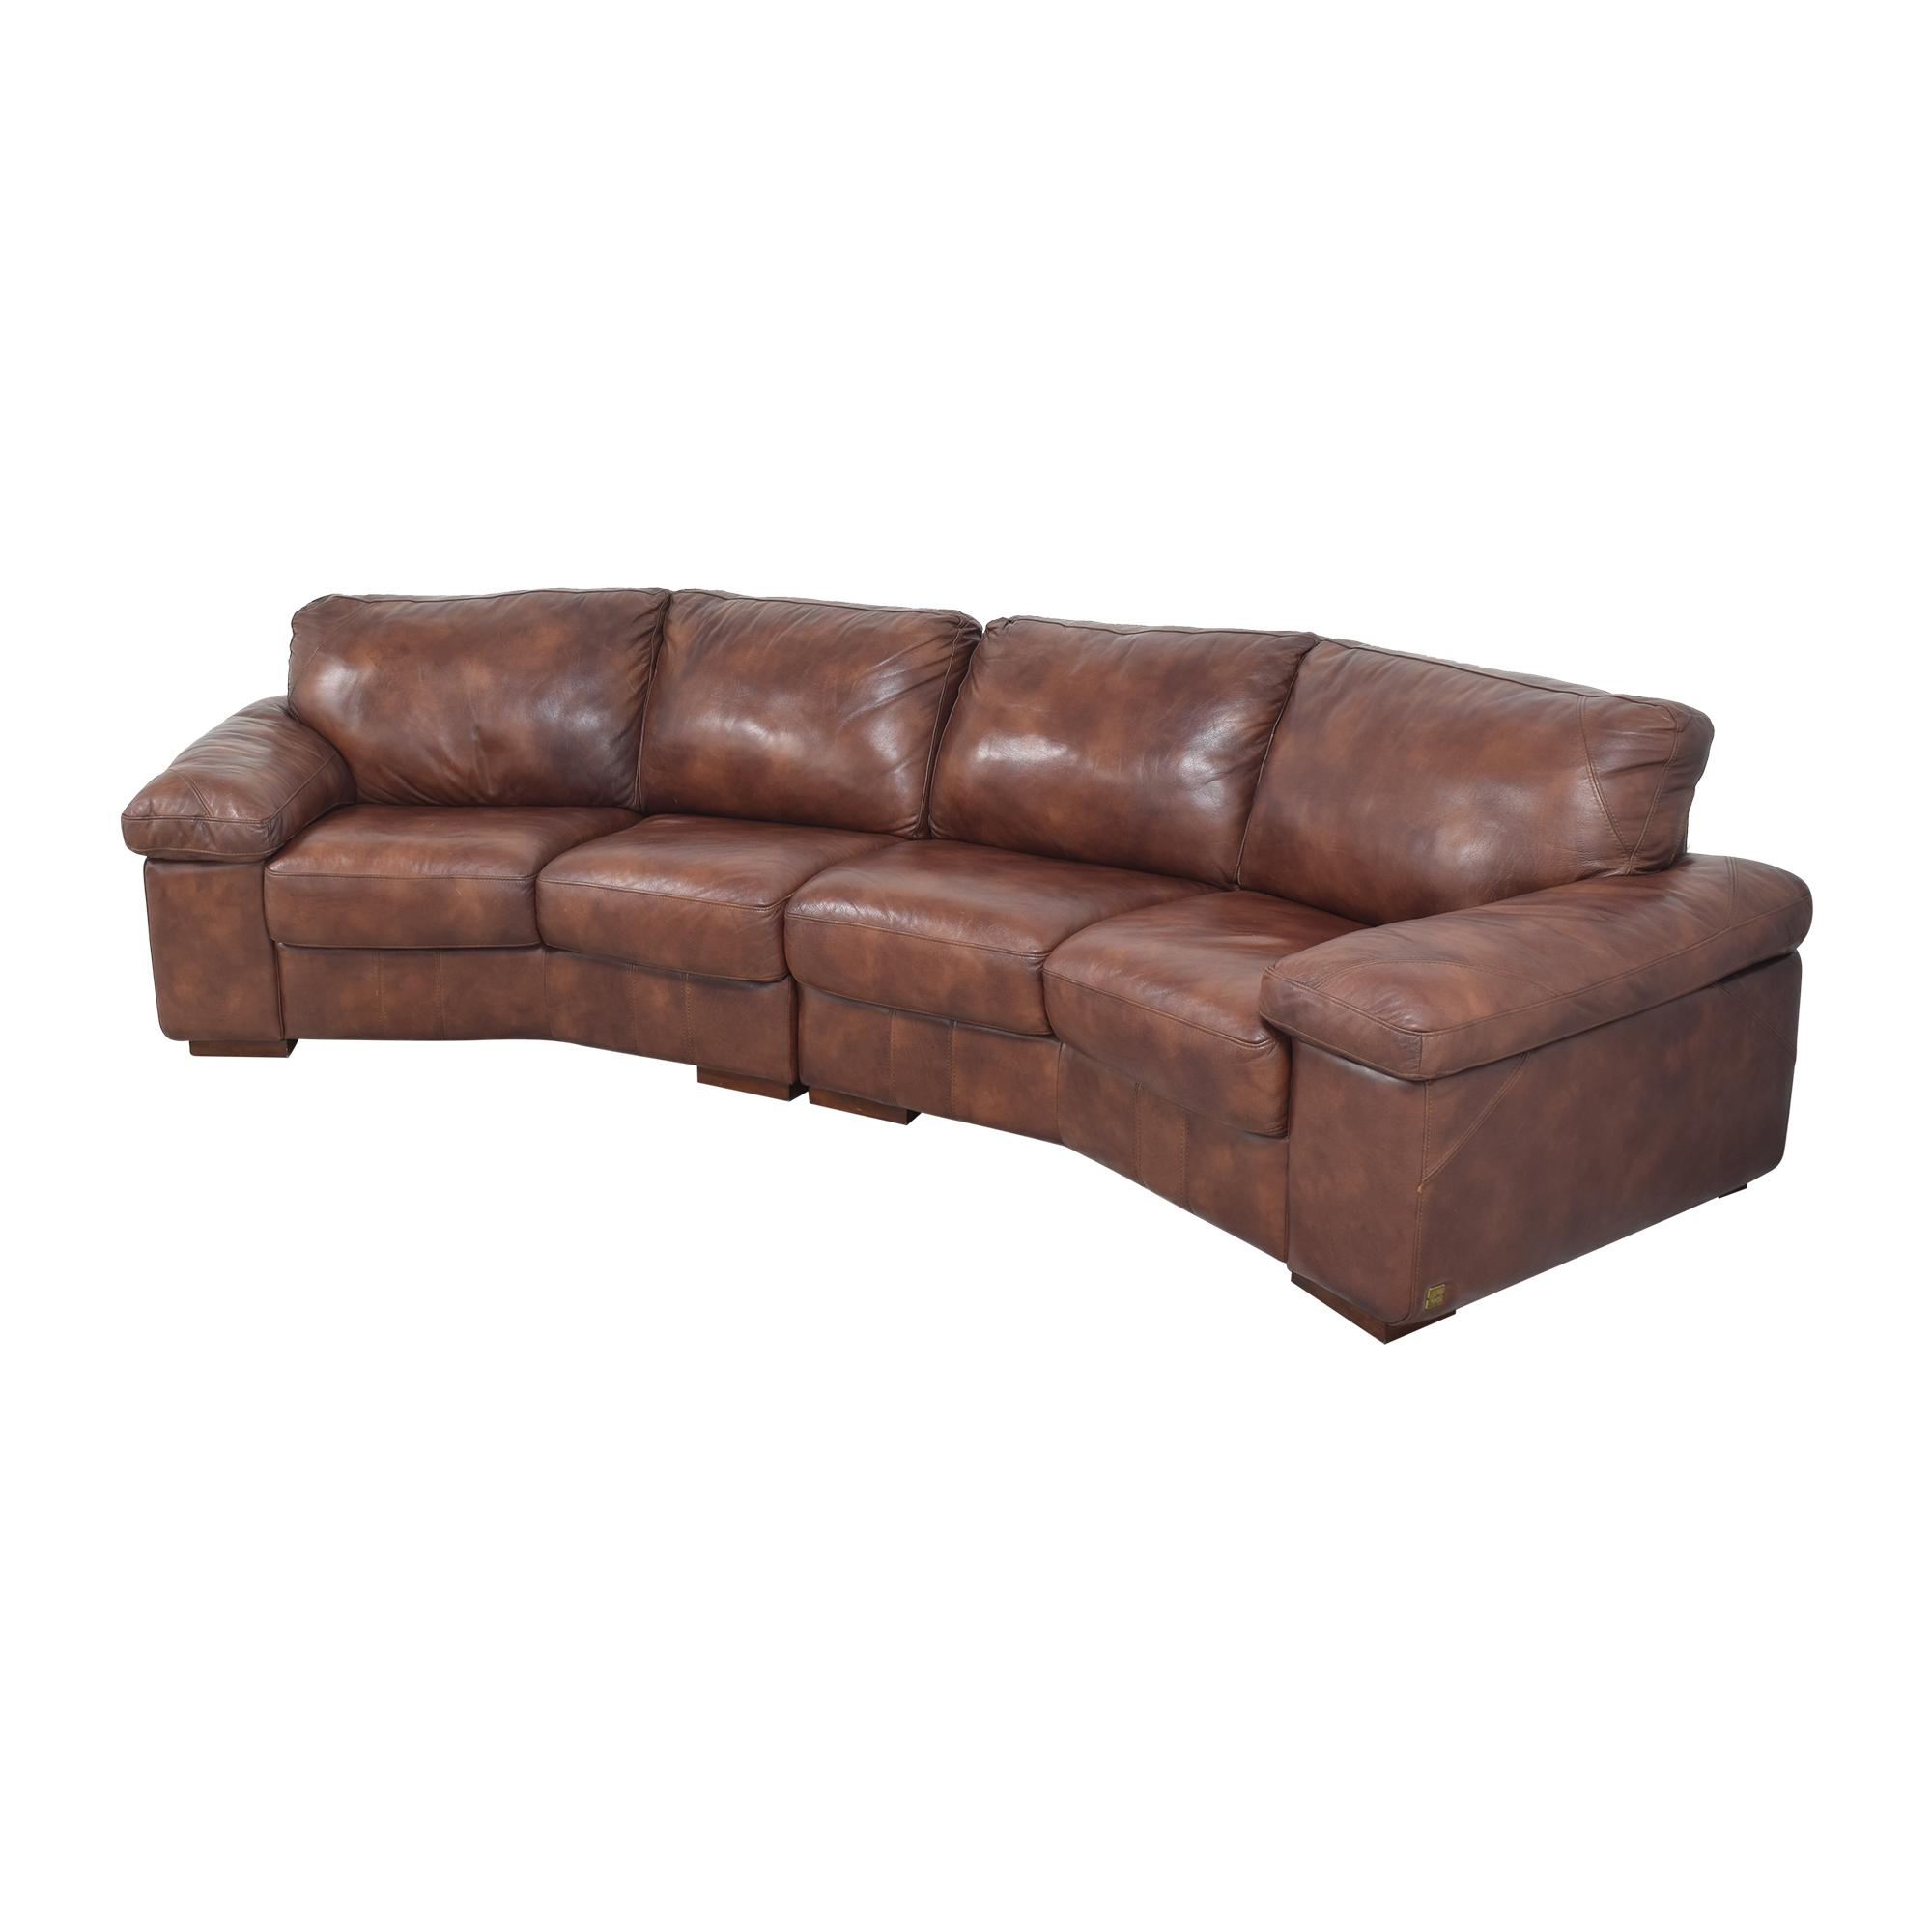 Bassett Furniture Bassett Two Piece Sectional Sofa with Ottomans discount